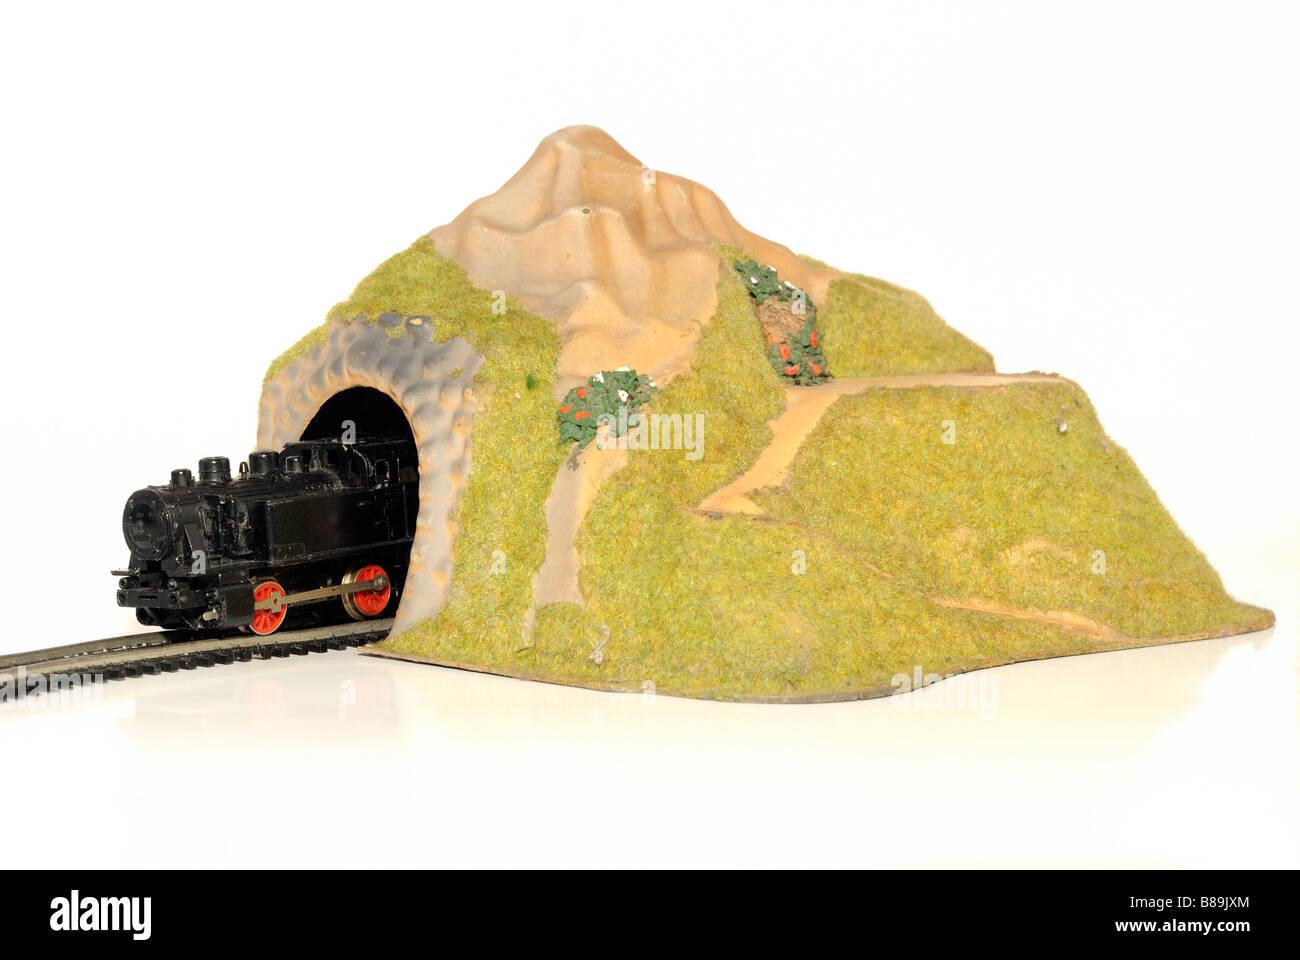 Steam locomotive engine model railway tunnel cut out still life - Stock Image